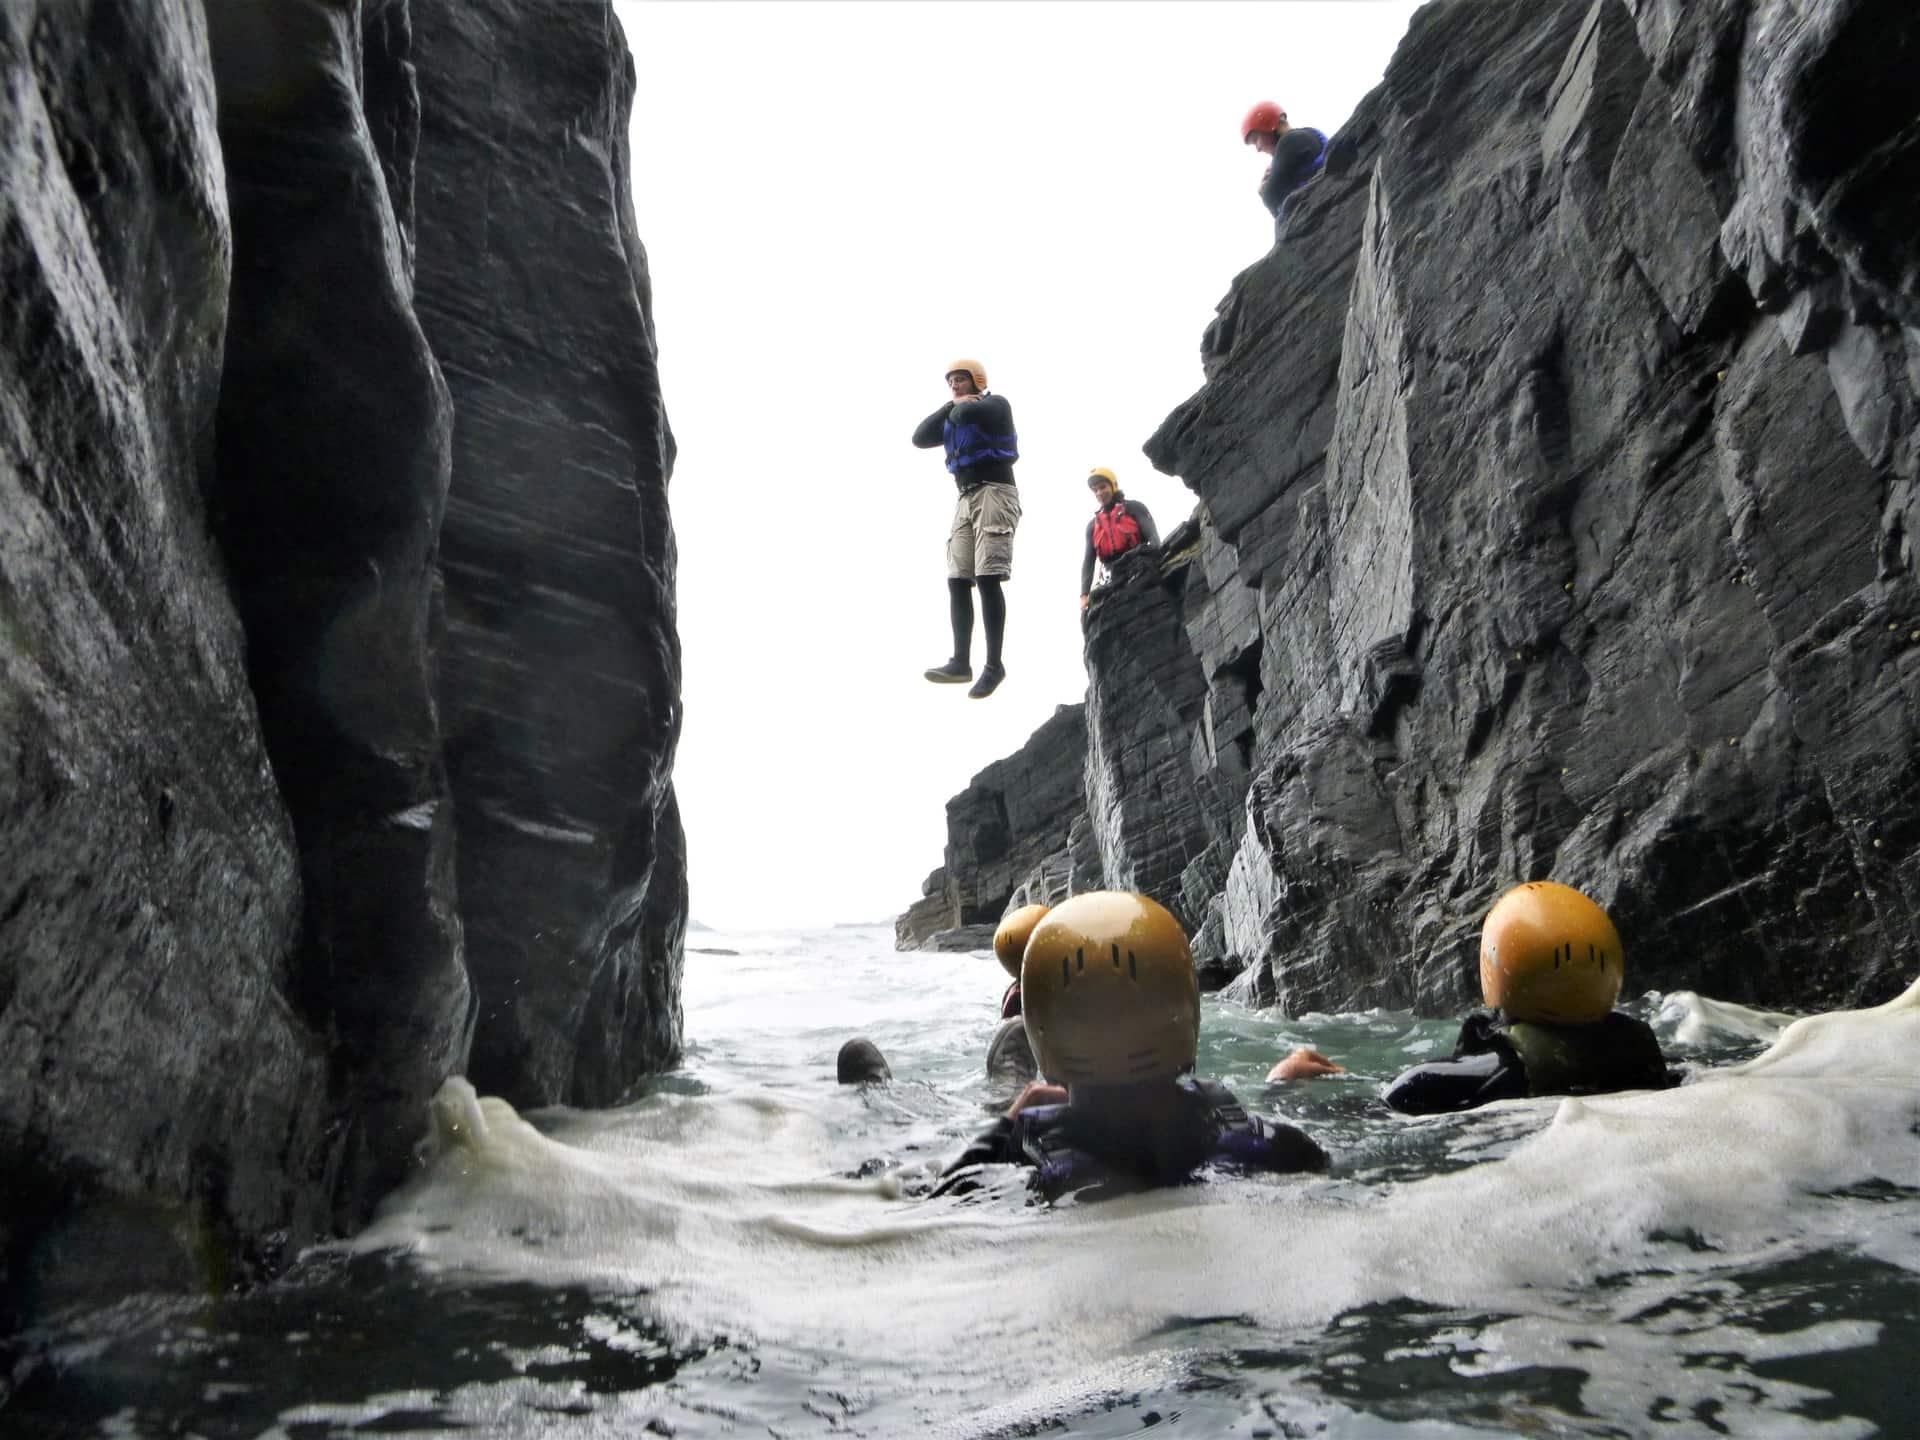 Cliff jump at Pestreath Cove, west of Praa Sands with Kernow Coasteering